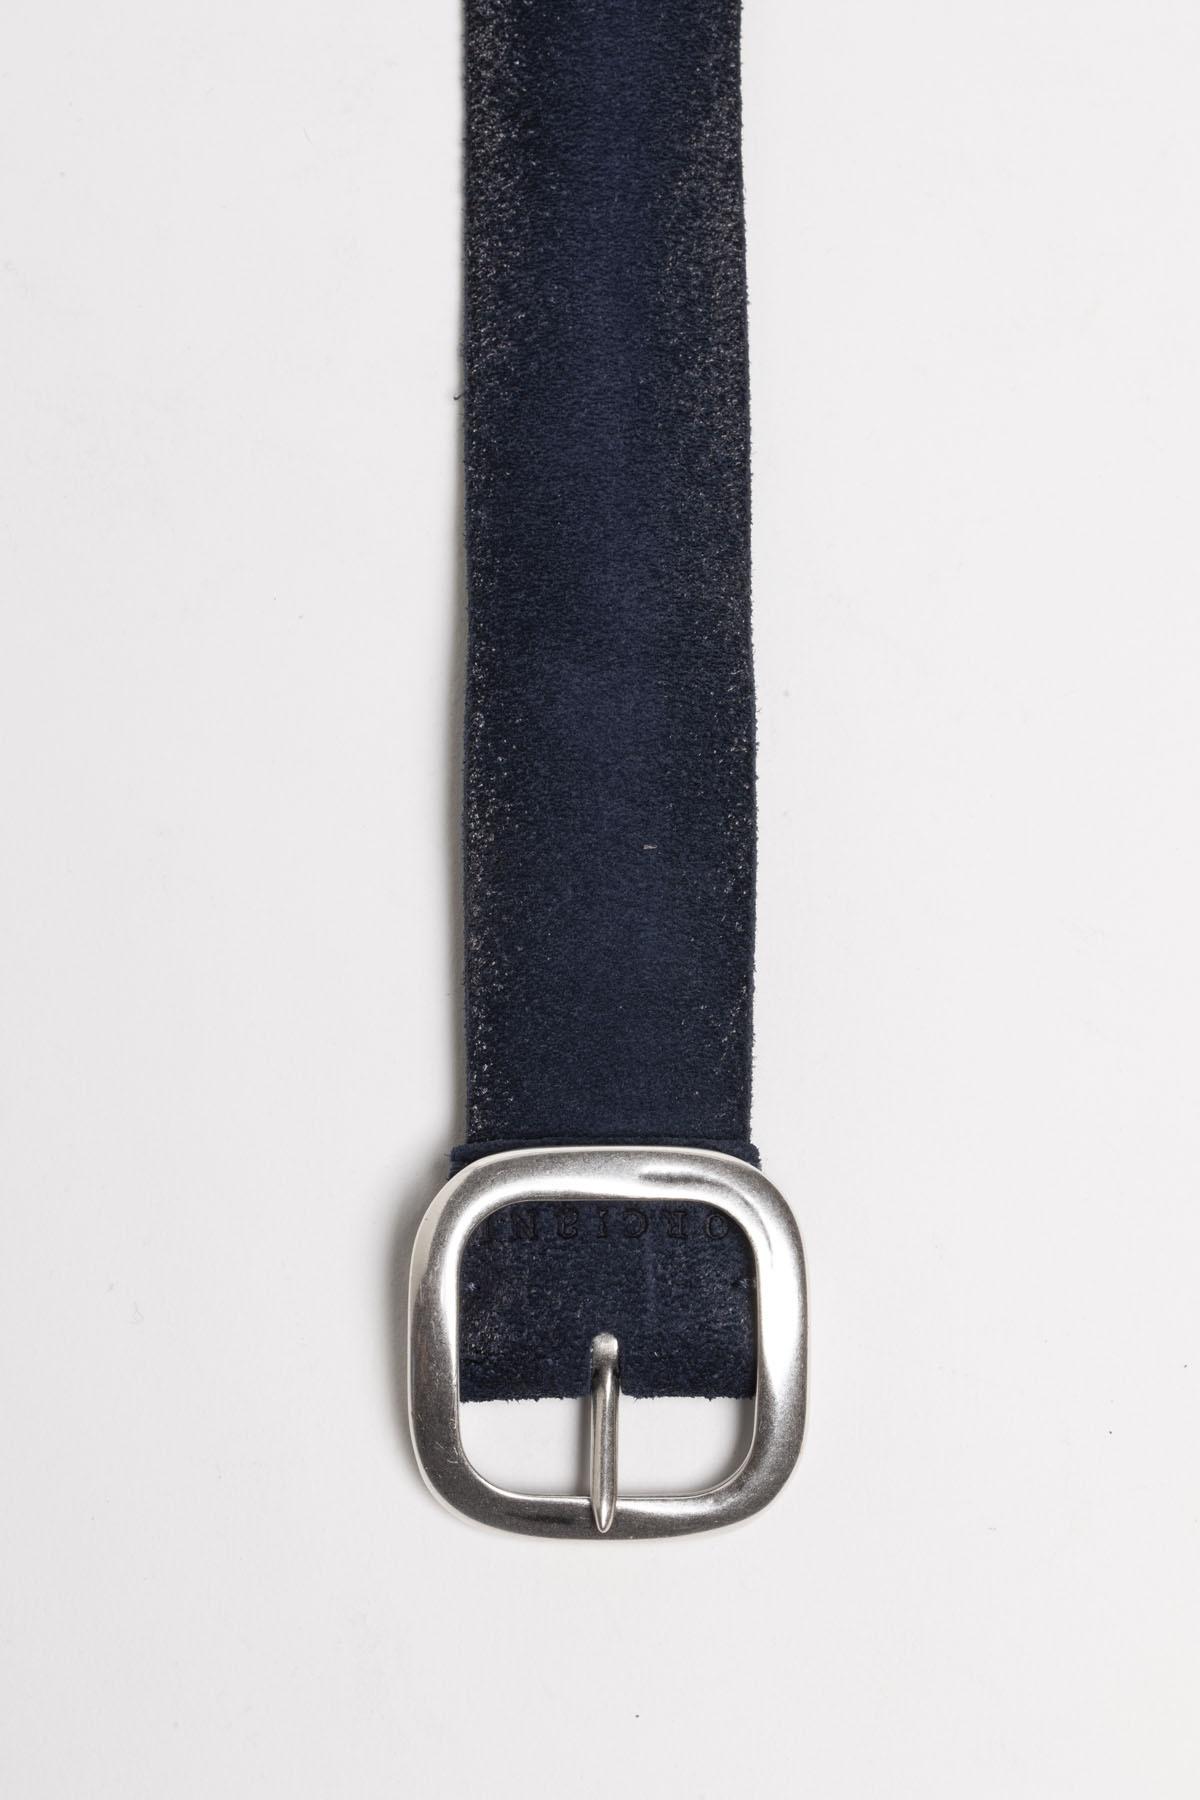 Cintura ORCIANI P/E